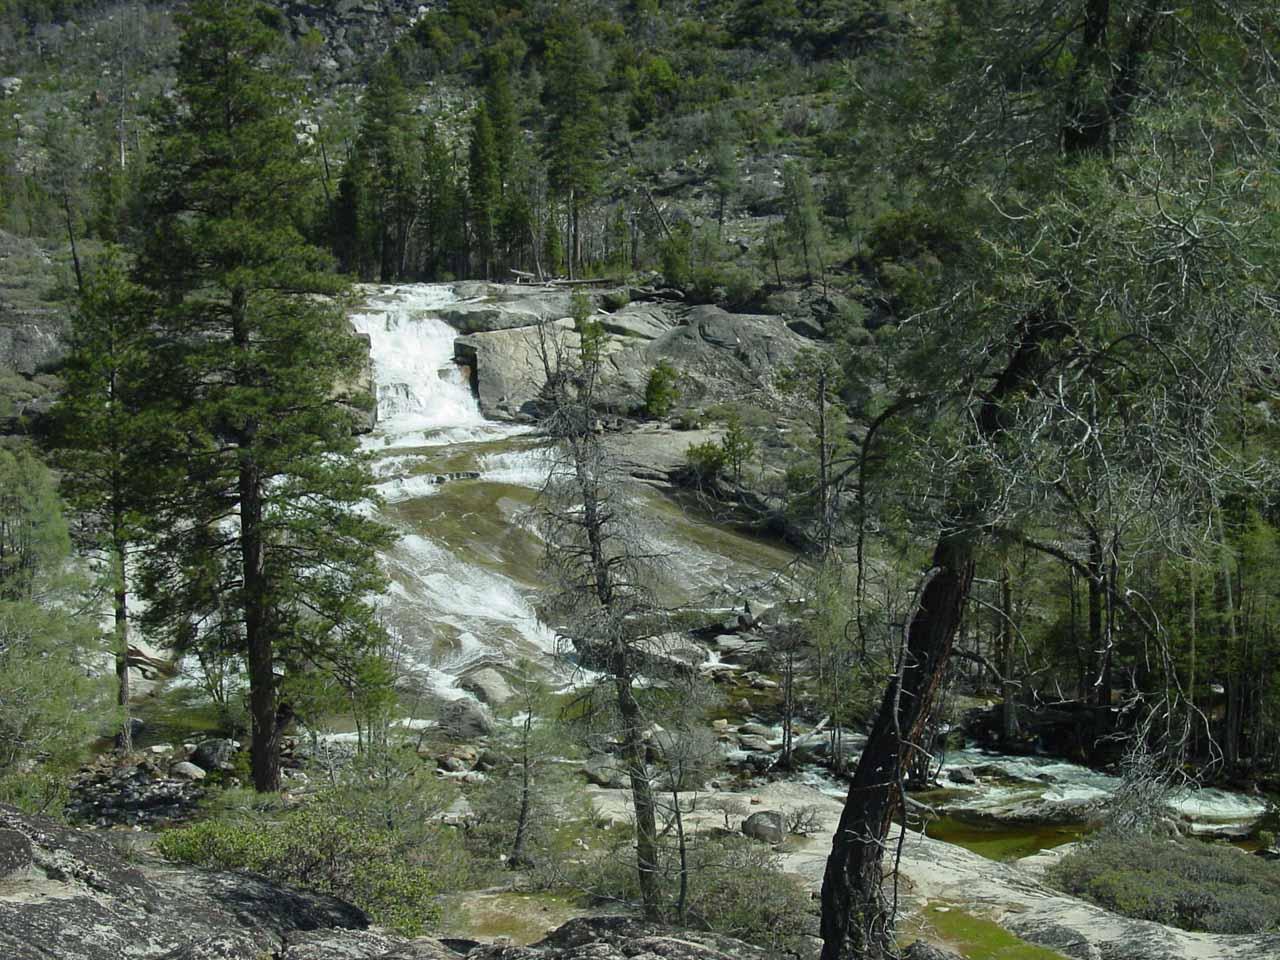 The first cascade of Rancheria Falls